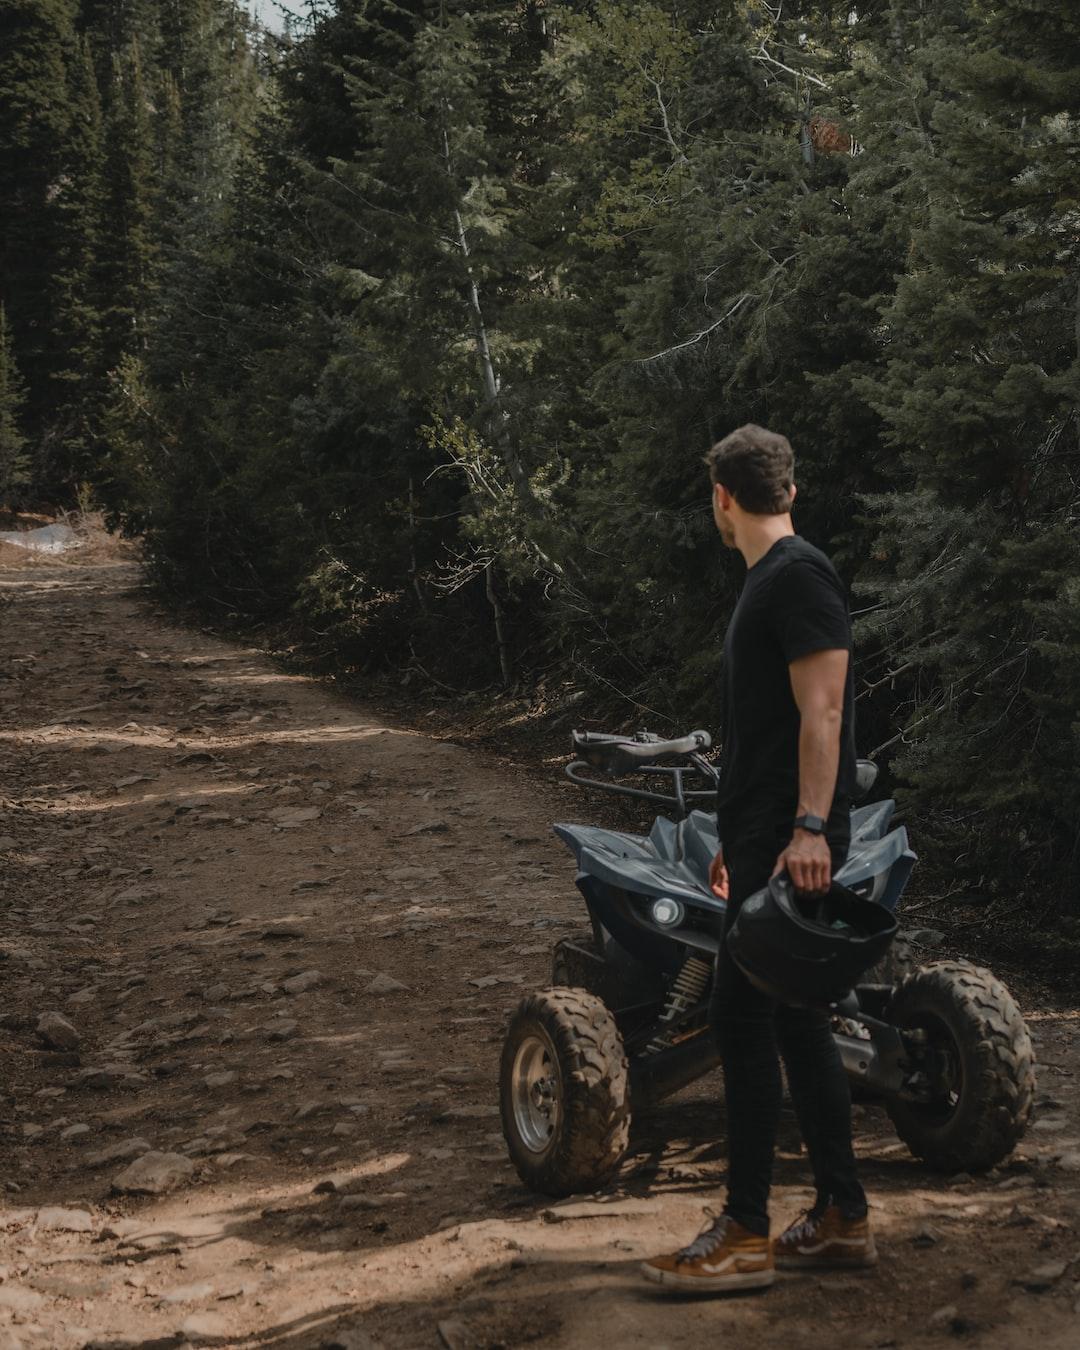 Dirt riding